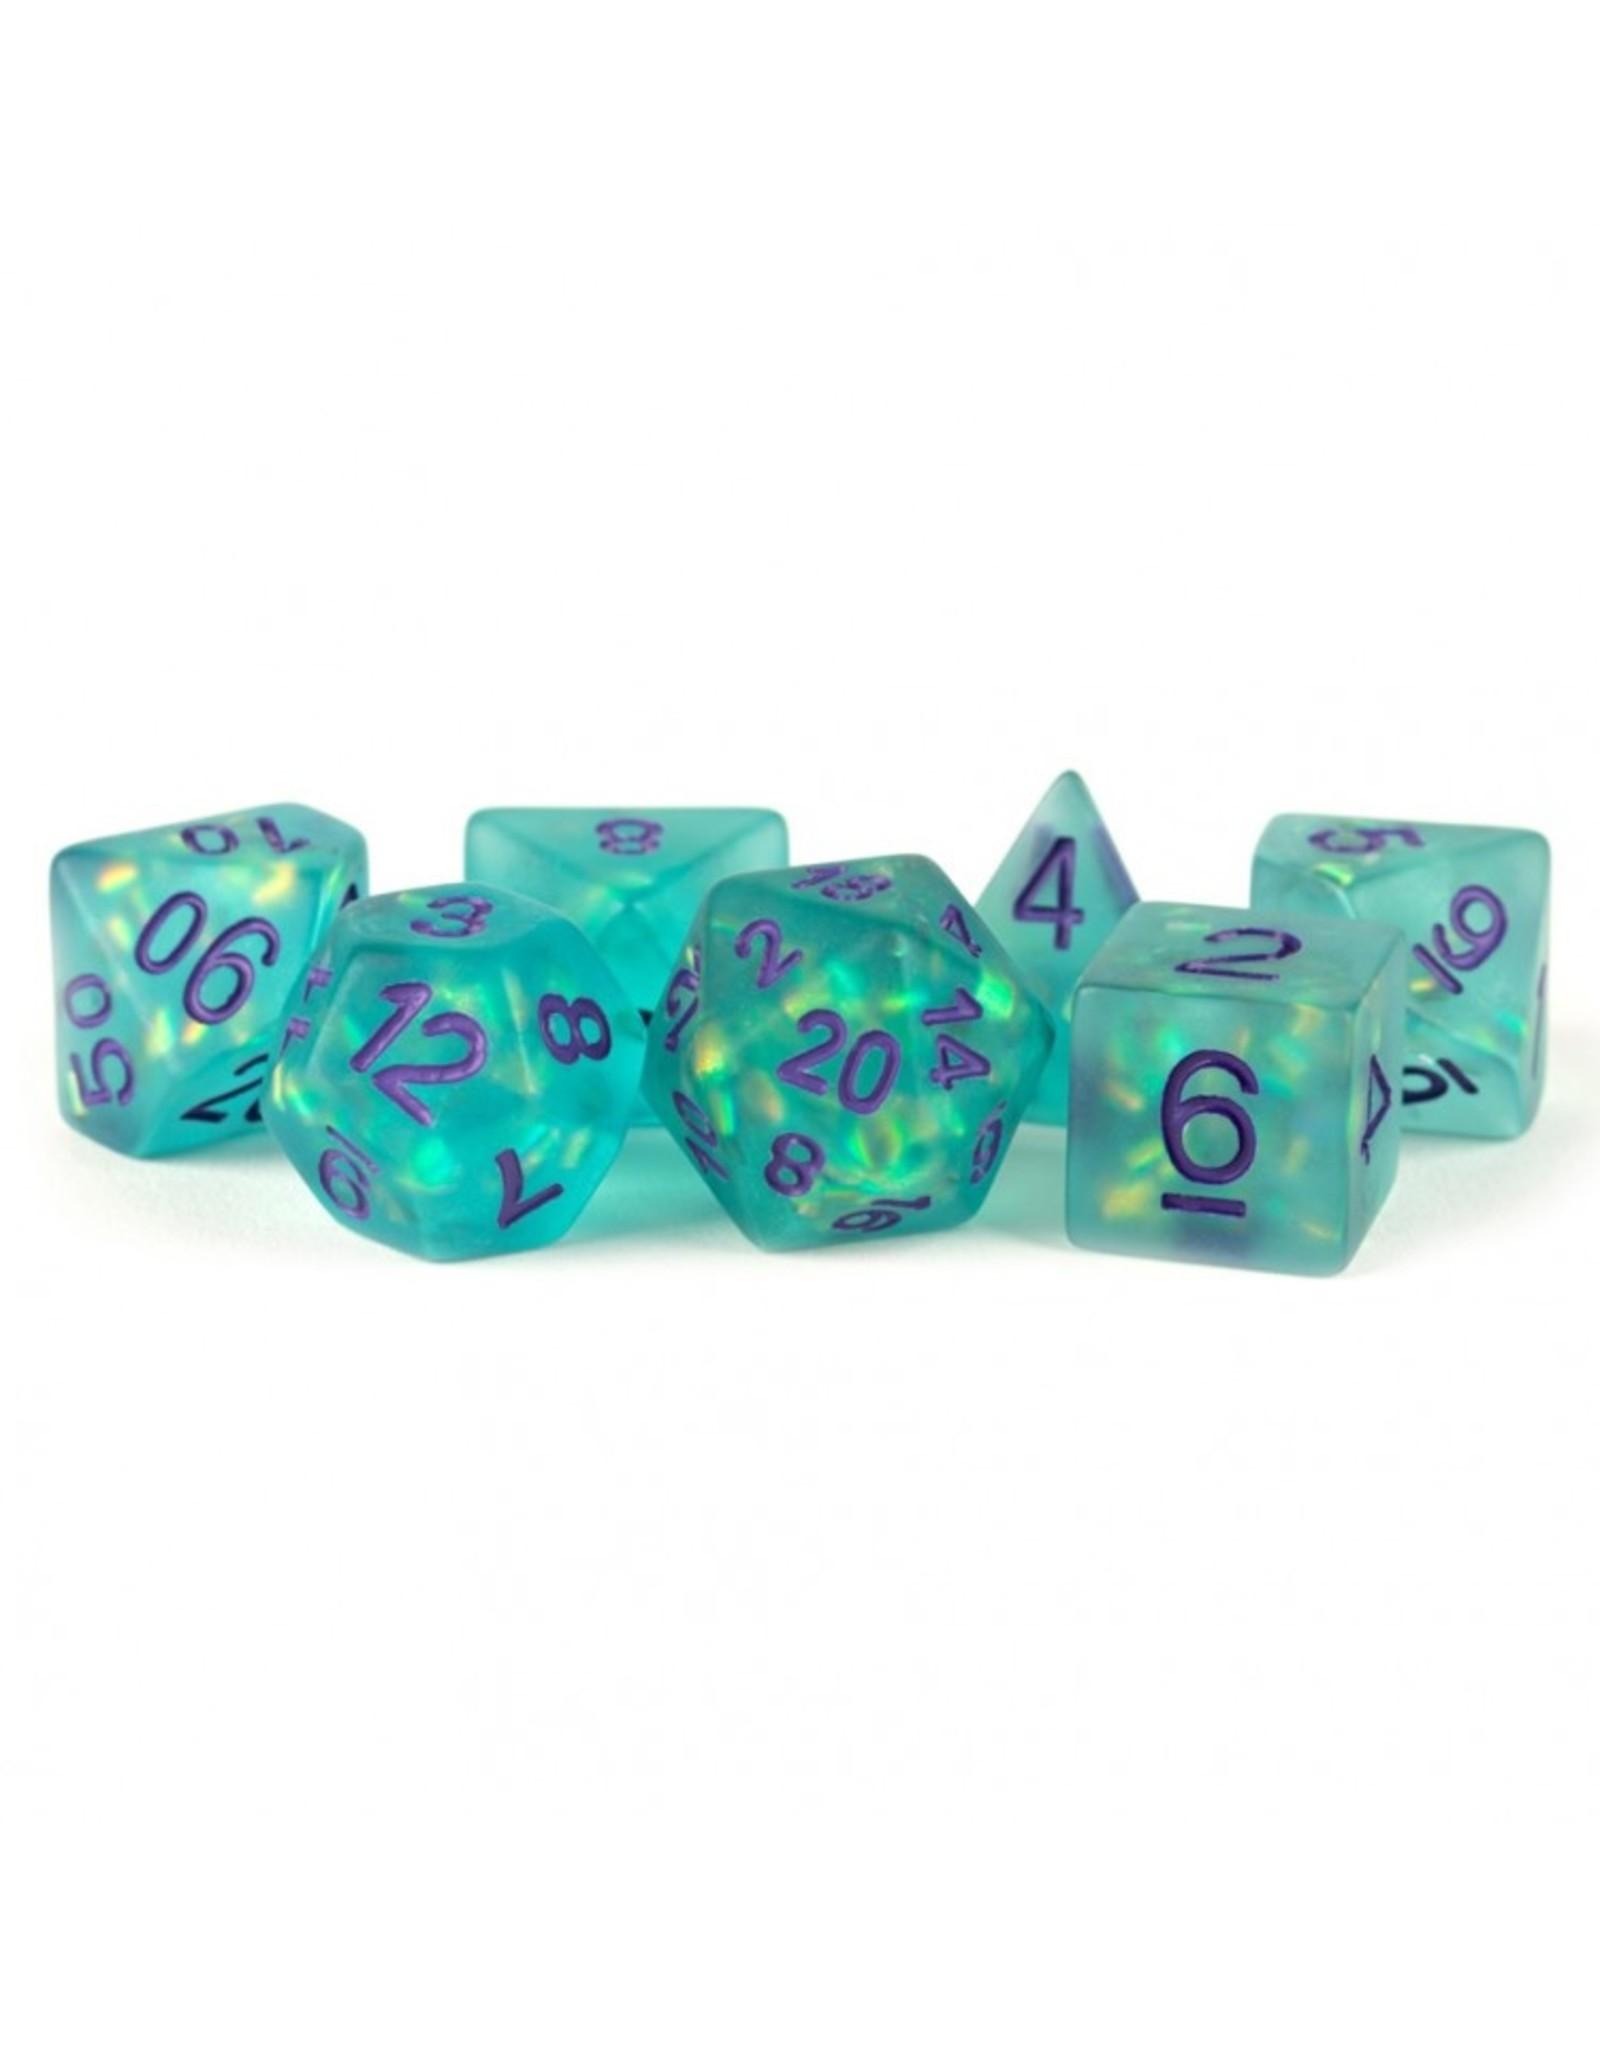 Dice 7-Set: Icy Opal TLpu